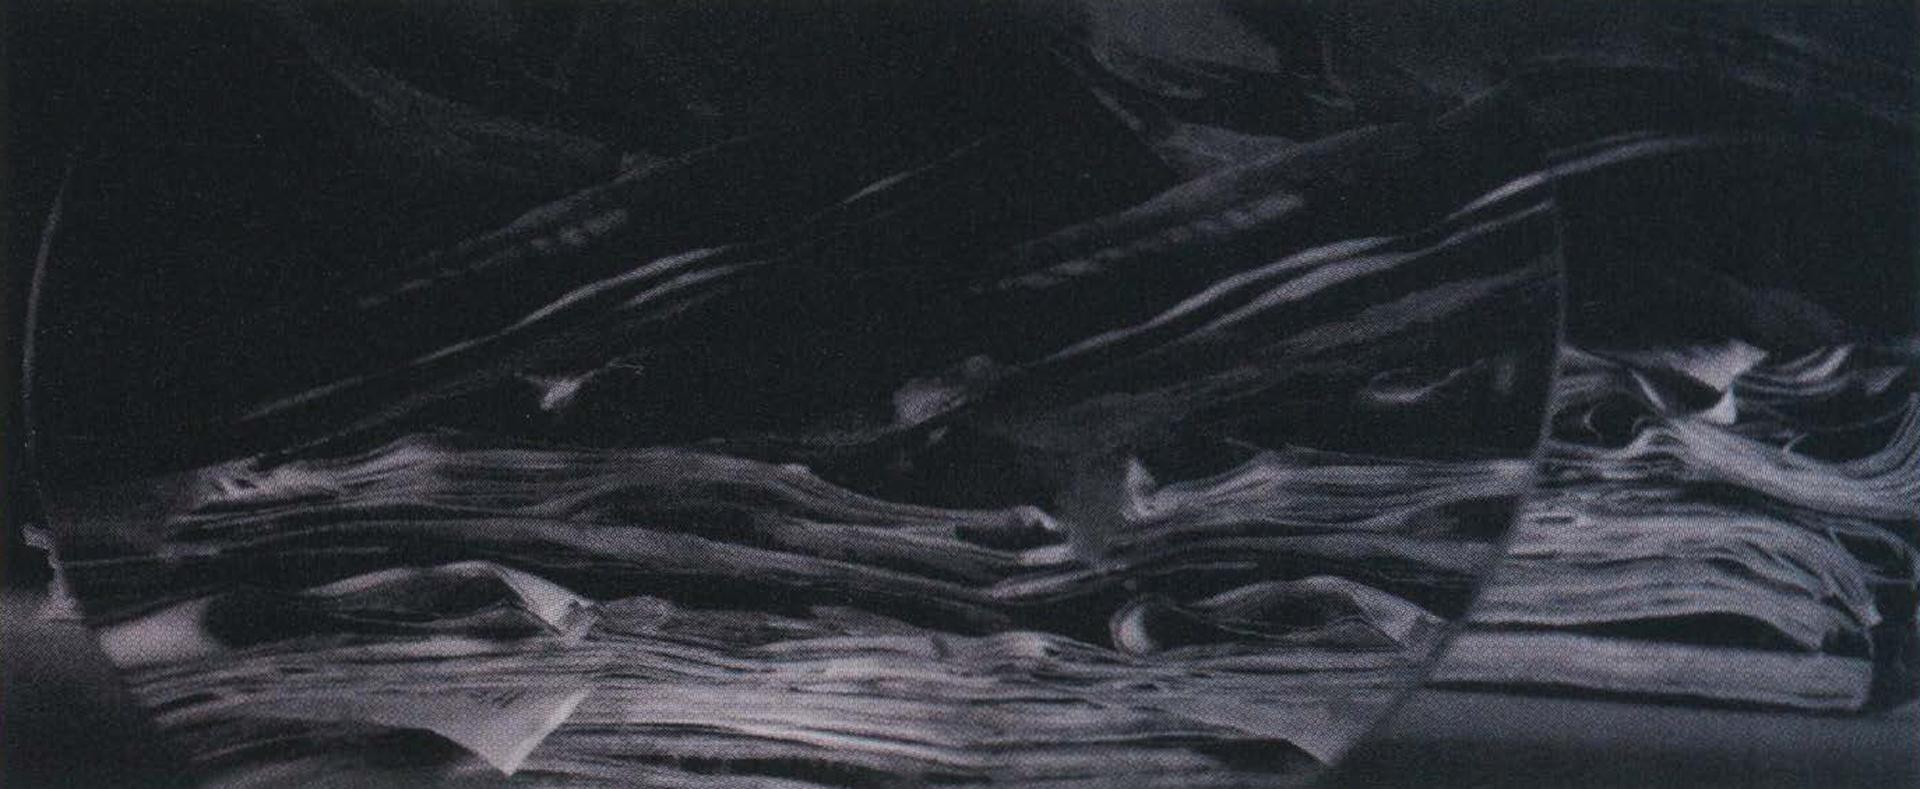 ©2001, Gloria DeFilipps Brush, 7471